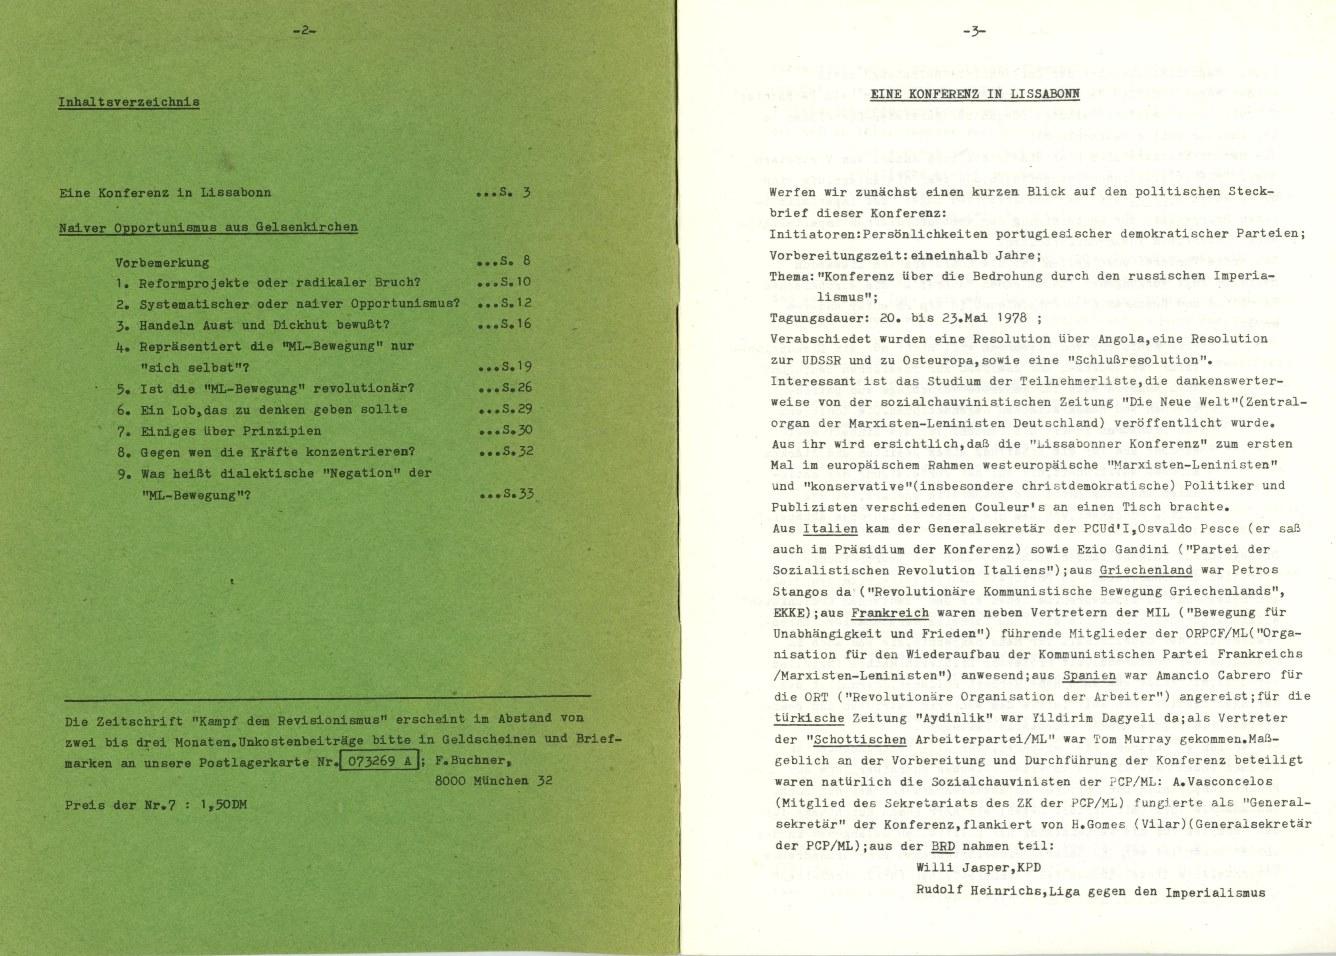 Muenchen_Kampf_dem_Revisionismus_1978_07_02